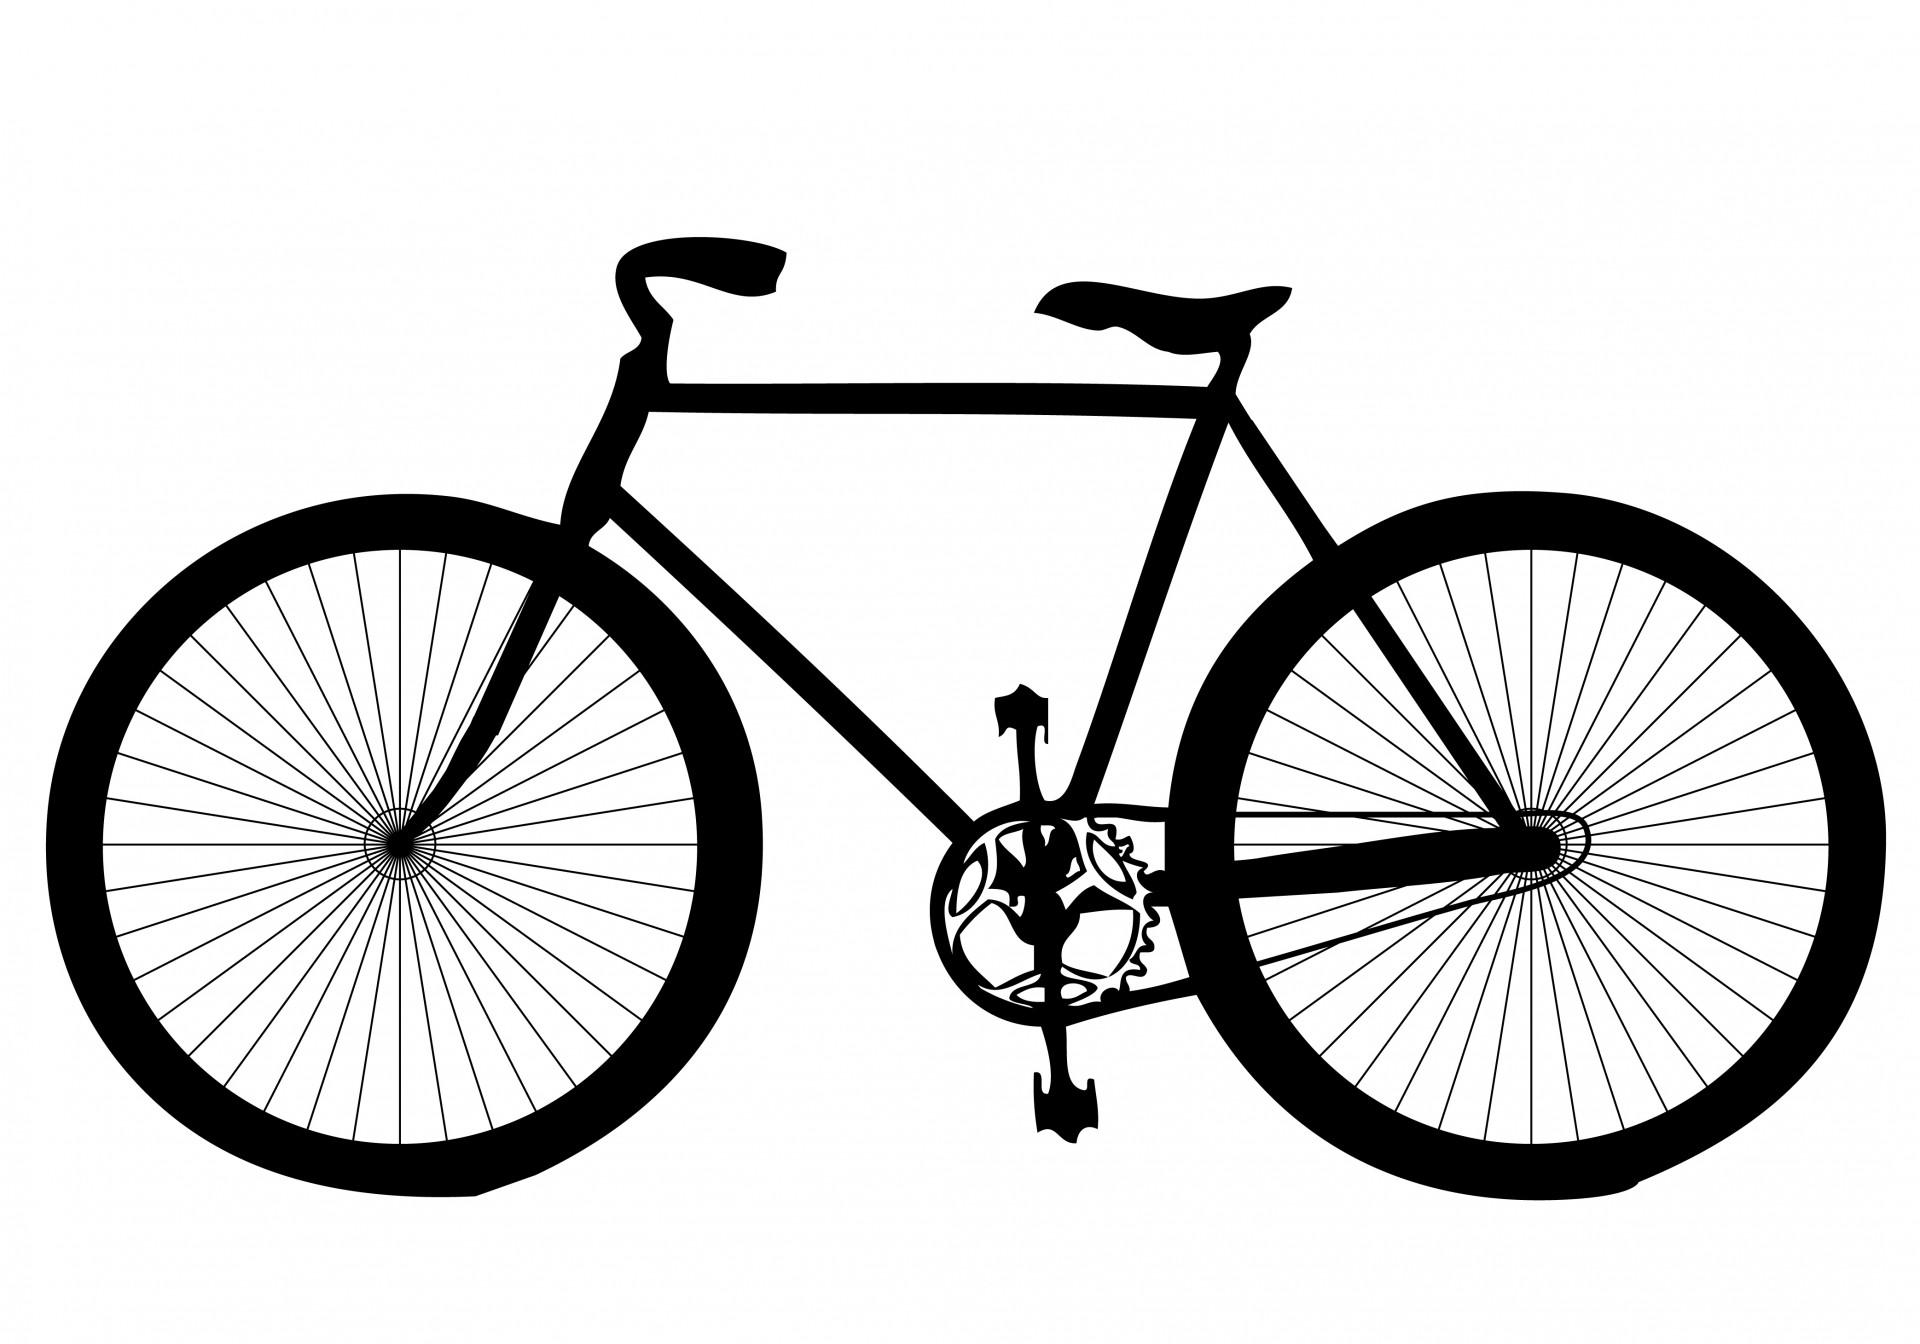 1920x1344 Bike Free Bicycle Clip Art Cmsalmon